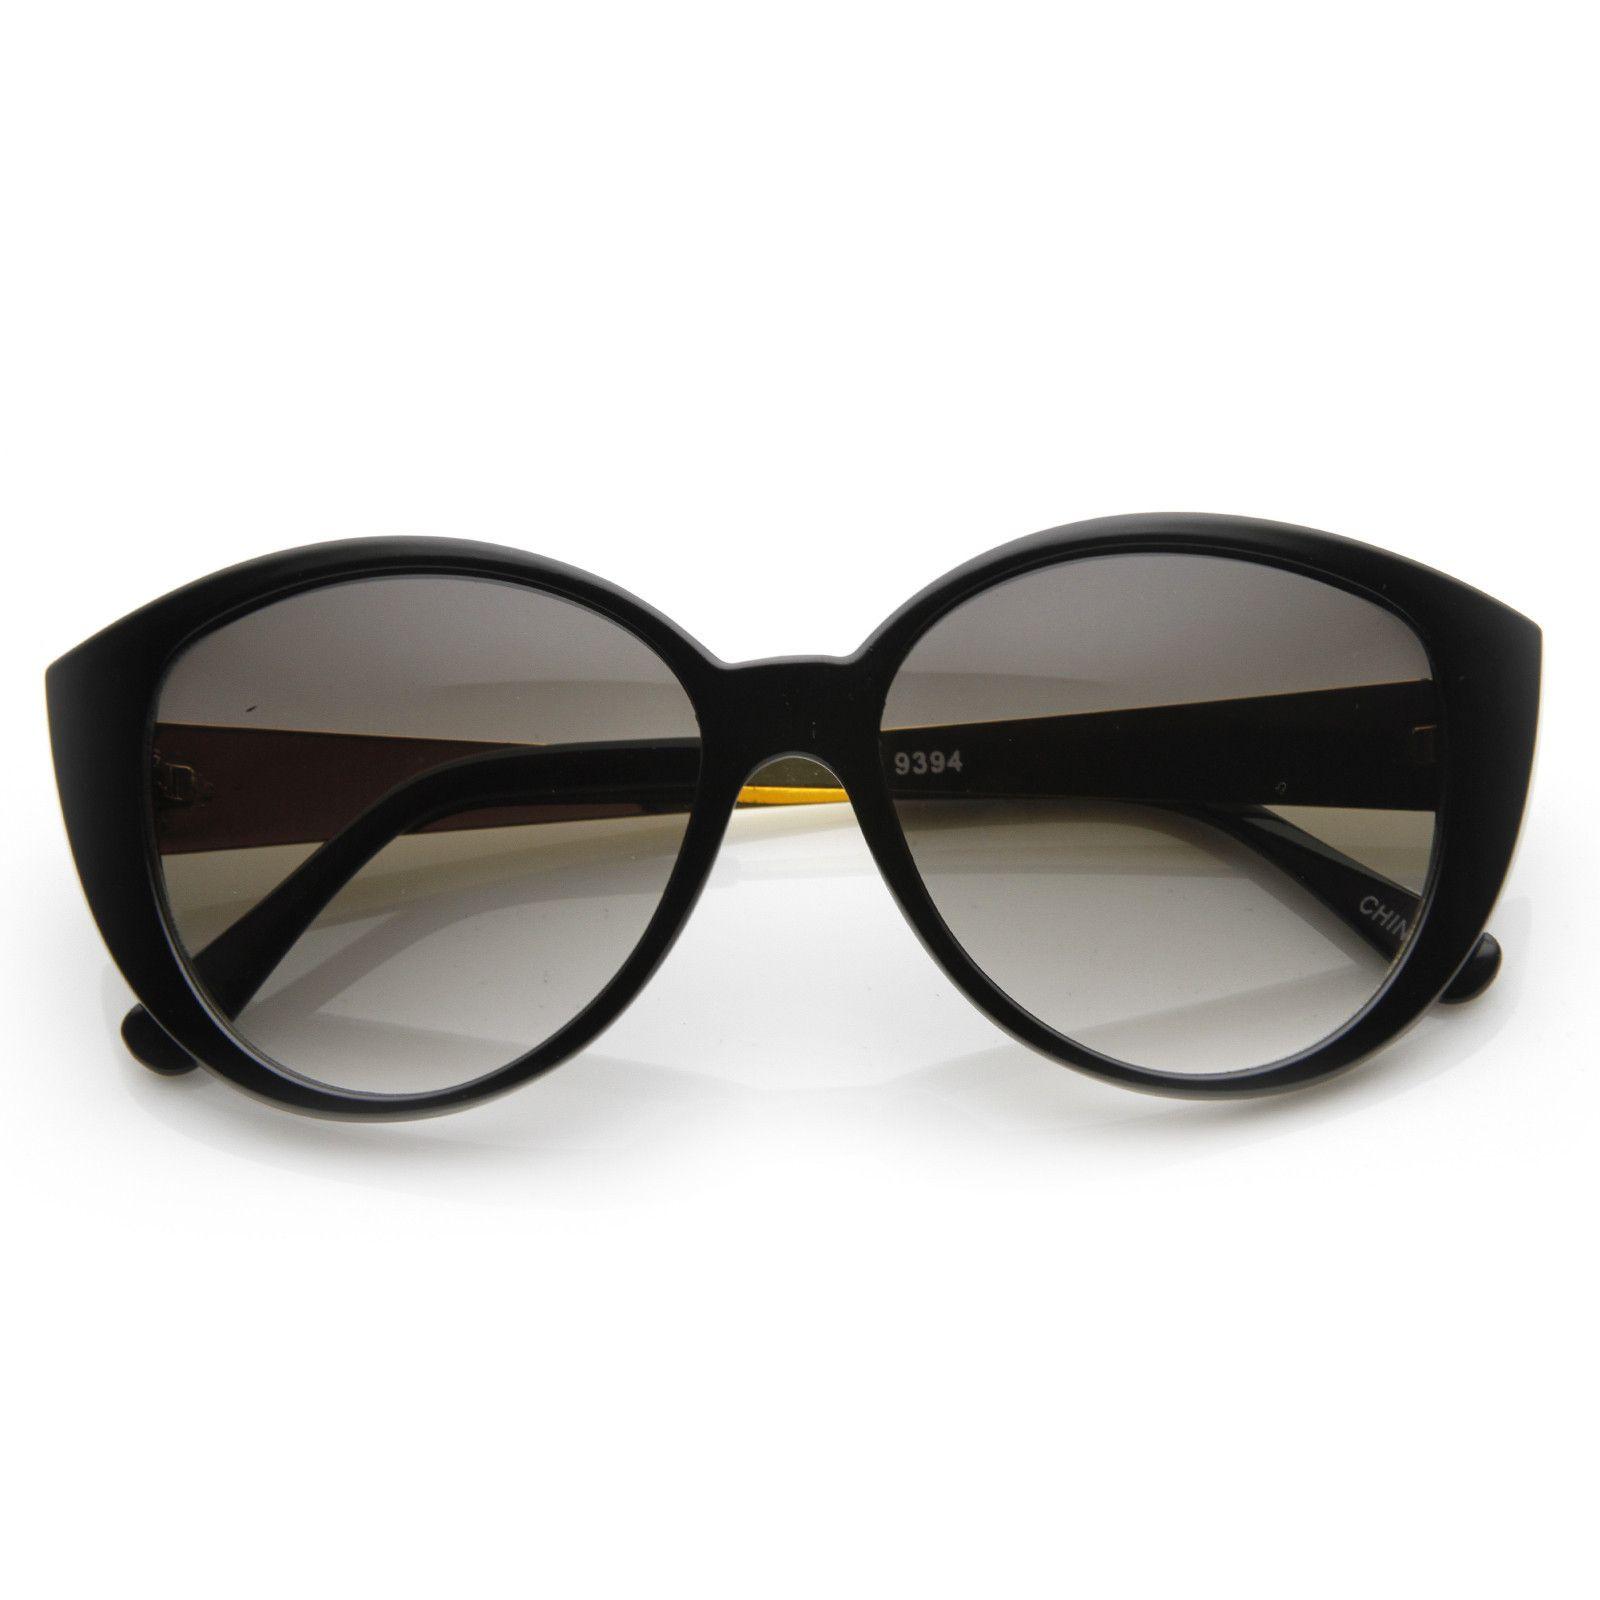 Large Women\'s Fashion Metal Arm Cat Eye Sunglasses 8689   Sunglasses ...